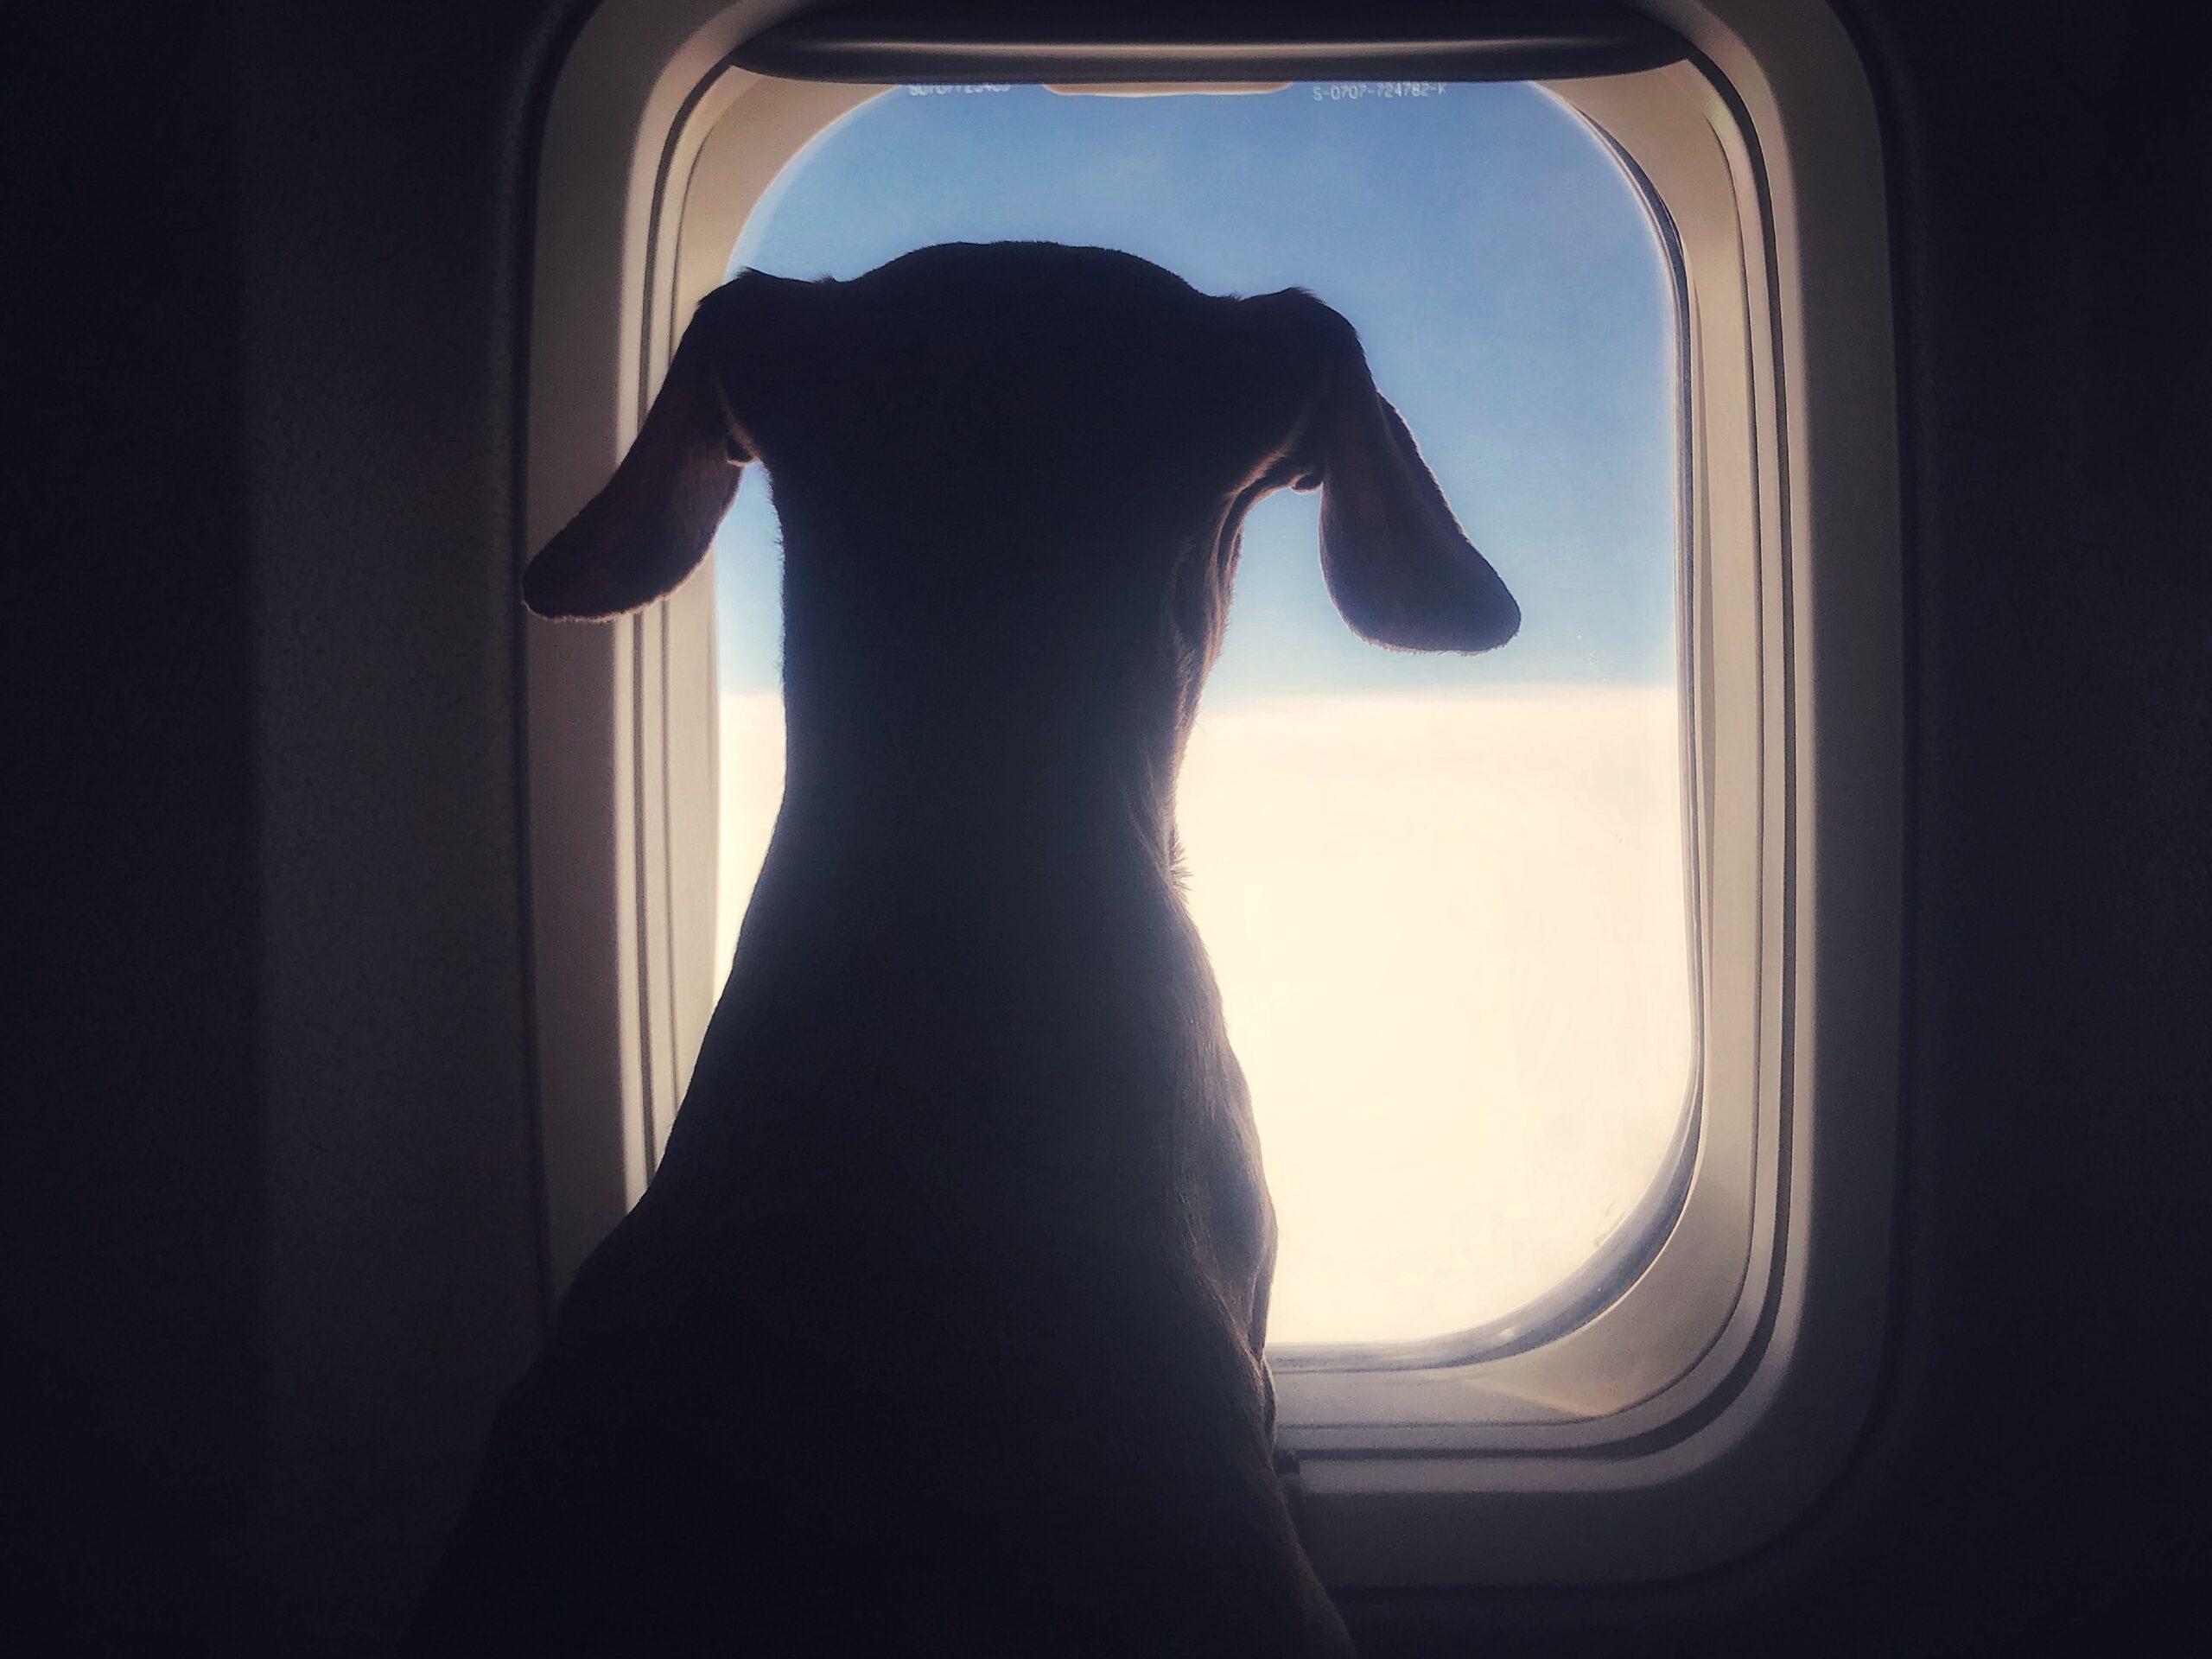 Dog looking through an airplane window